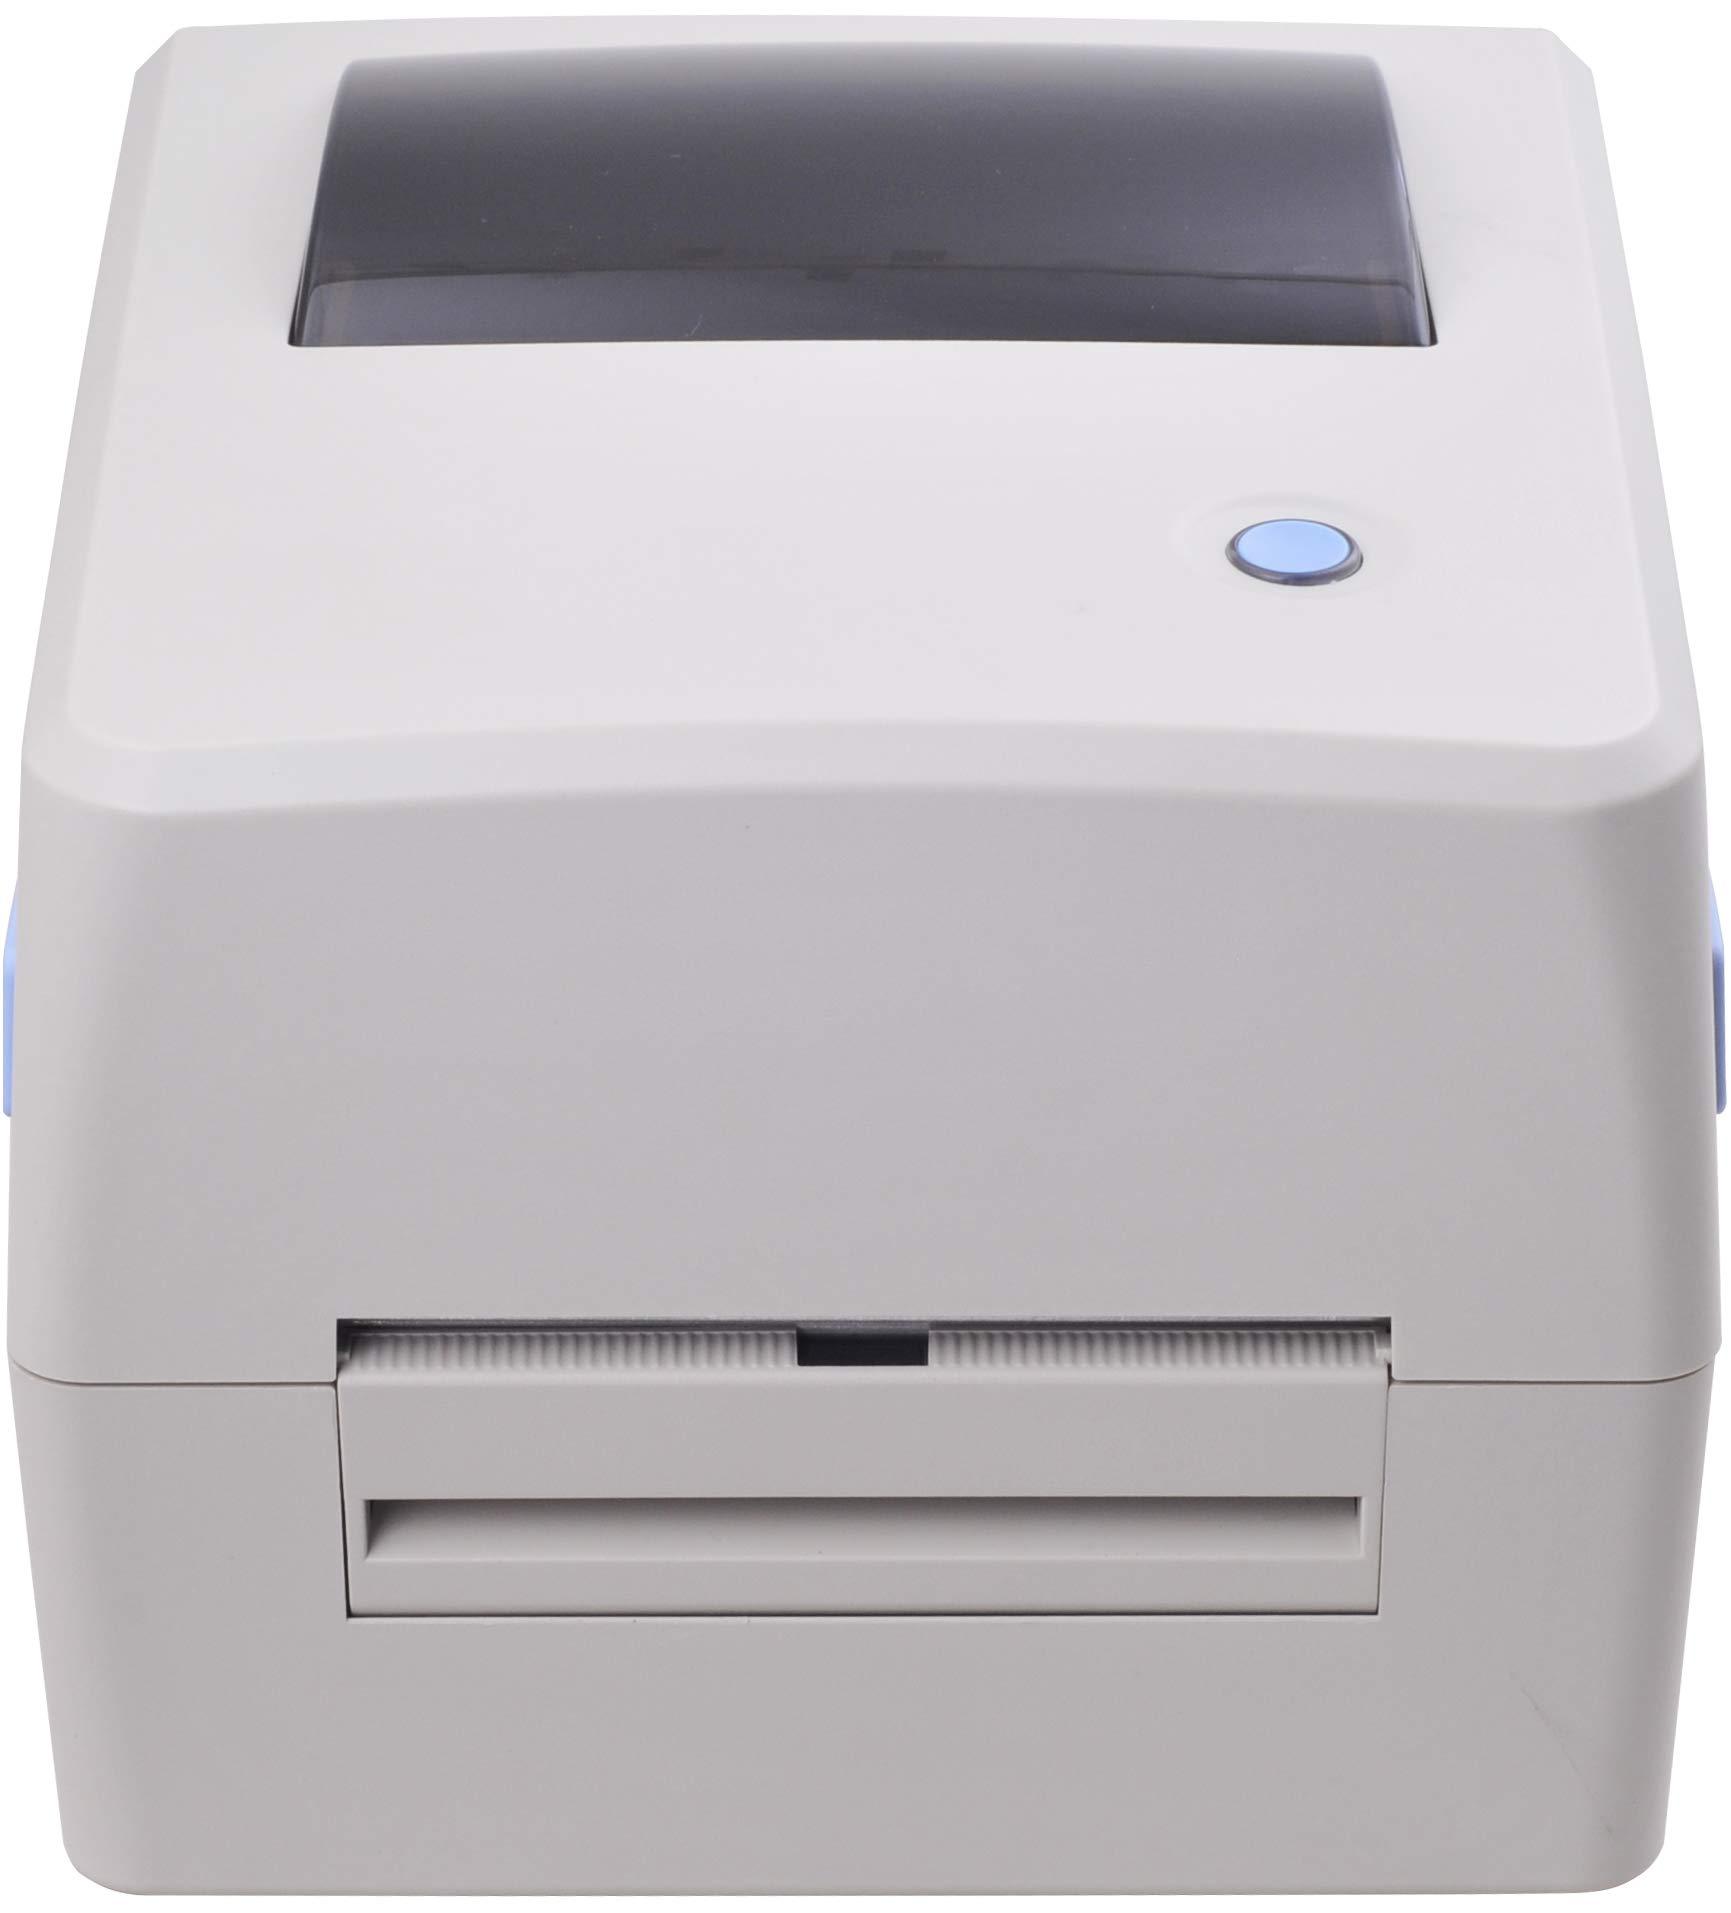 Xprinter XP-TT424B 110mm 4.3inch 203dpi Thermal and Thermal-Transfer Label Printer,Thermal and Thermal-Transfer Barcode Printer, USB 2.0 Interface by xprinter (Image #3)